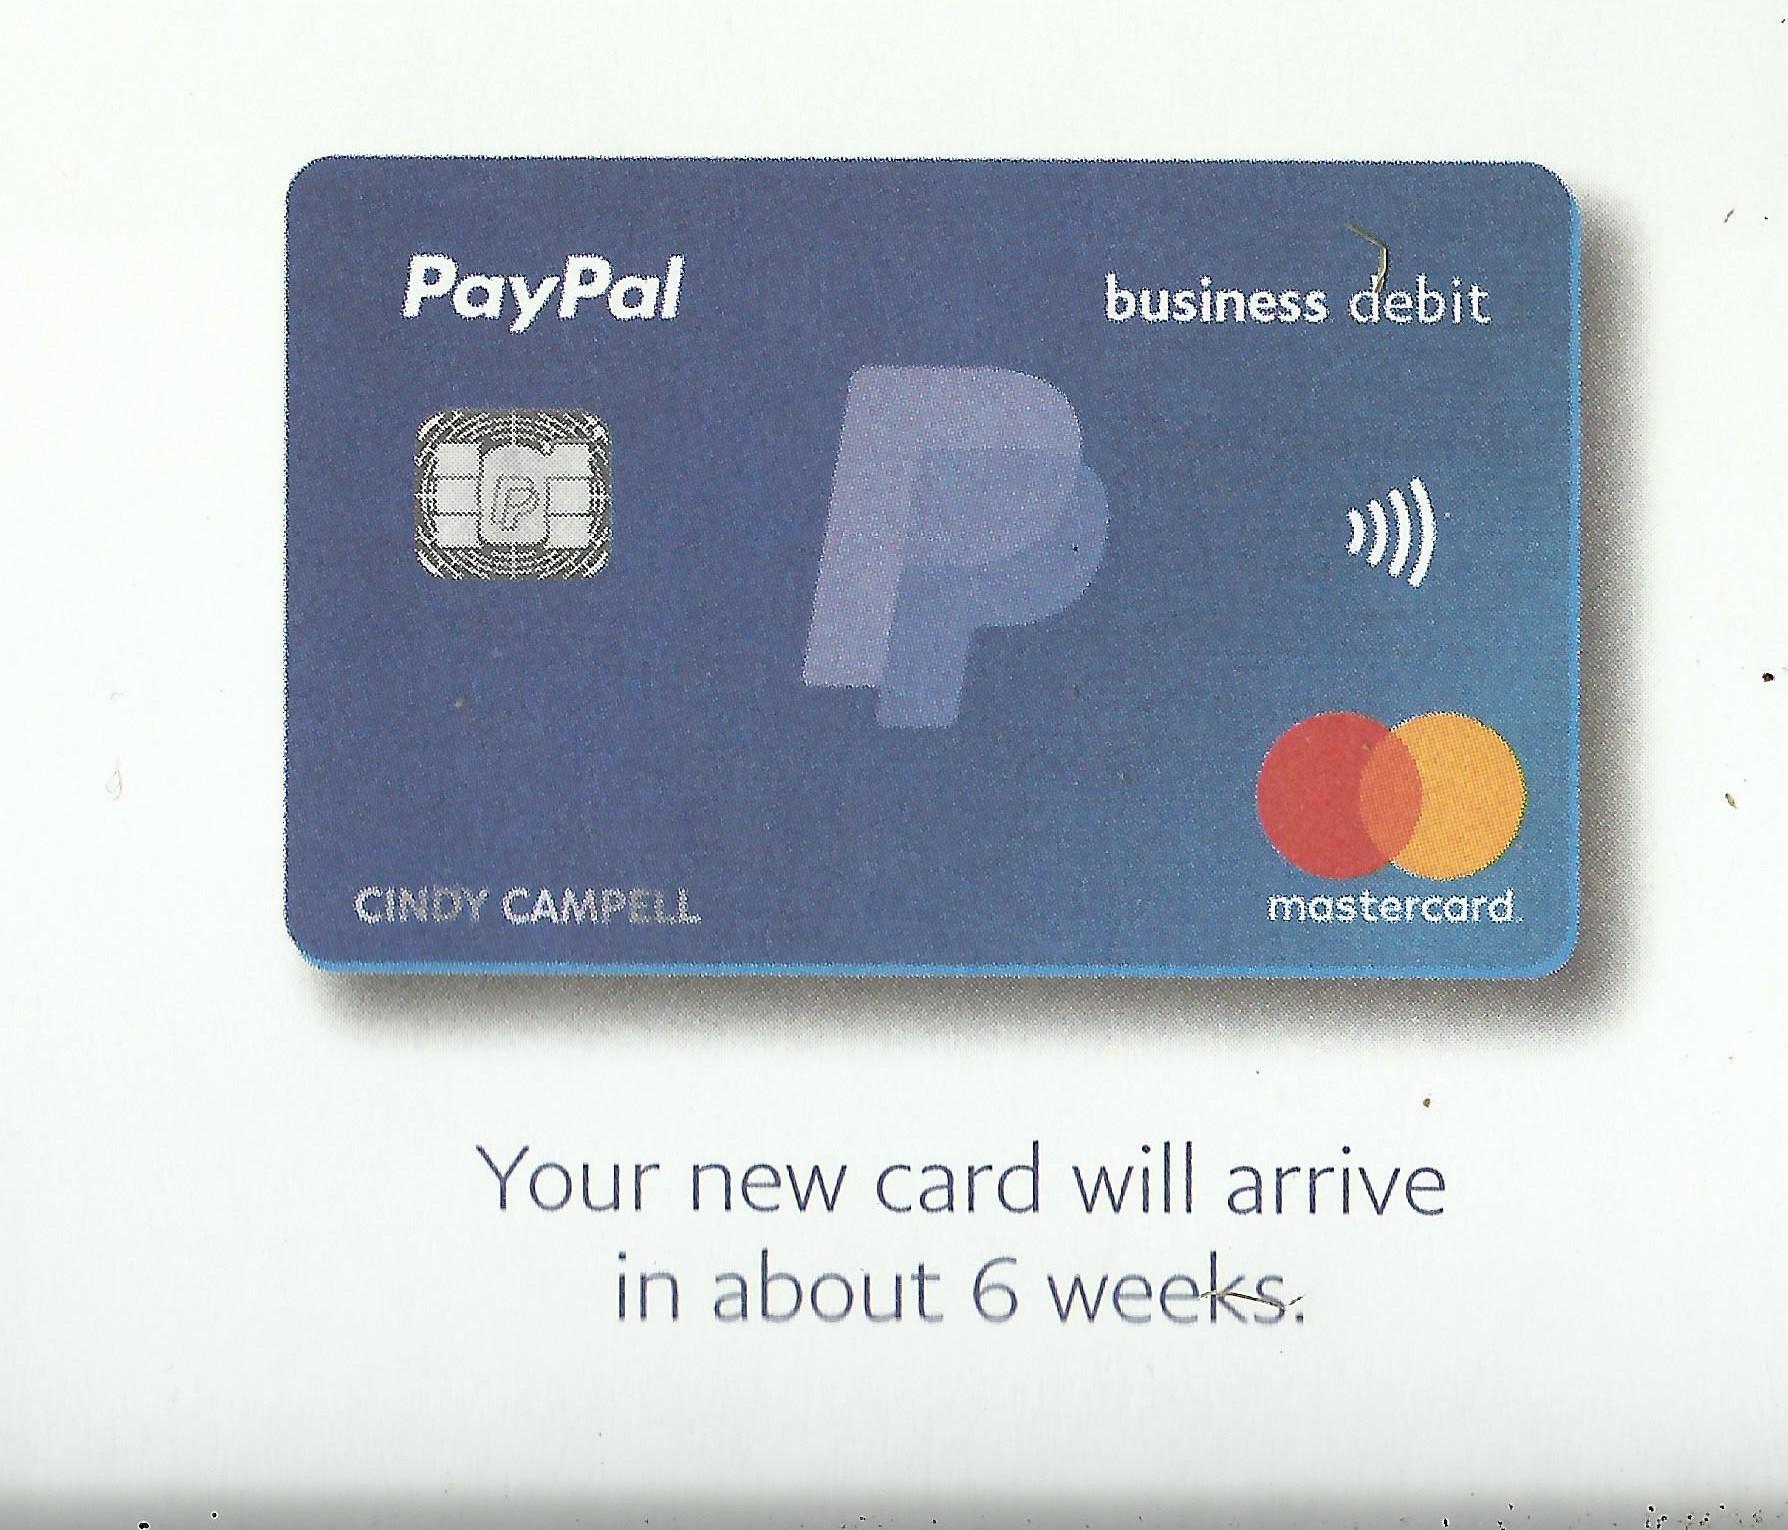 Paypal business debit mastercard mylot colourmoves